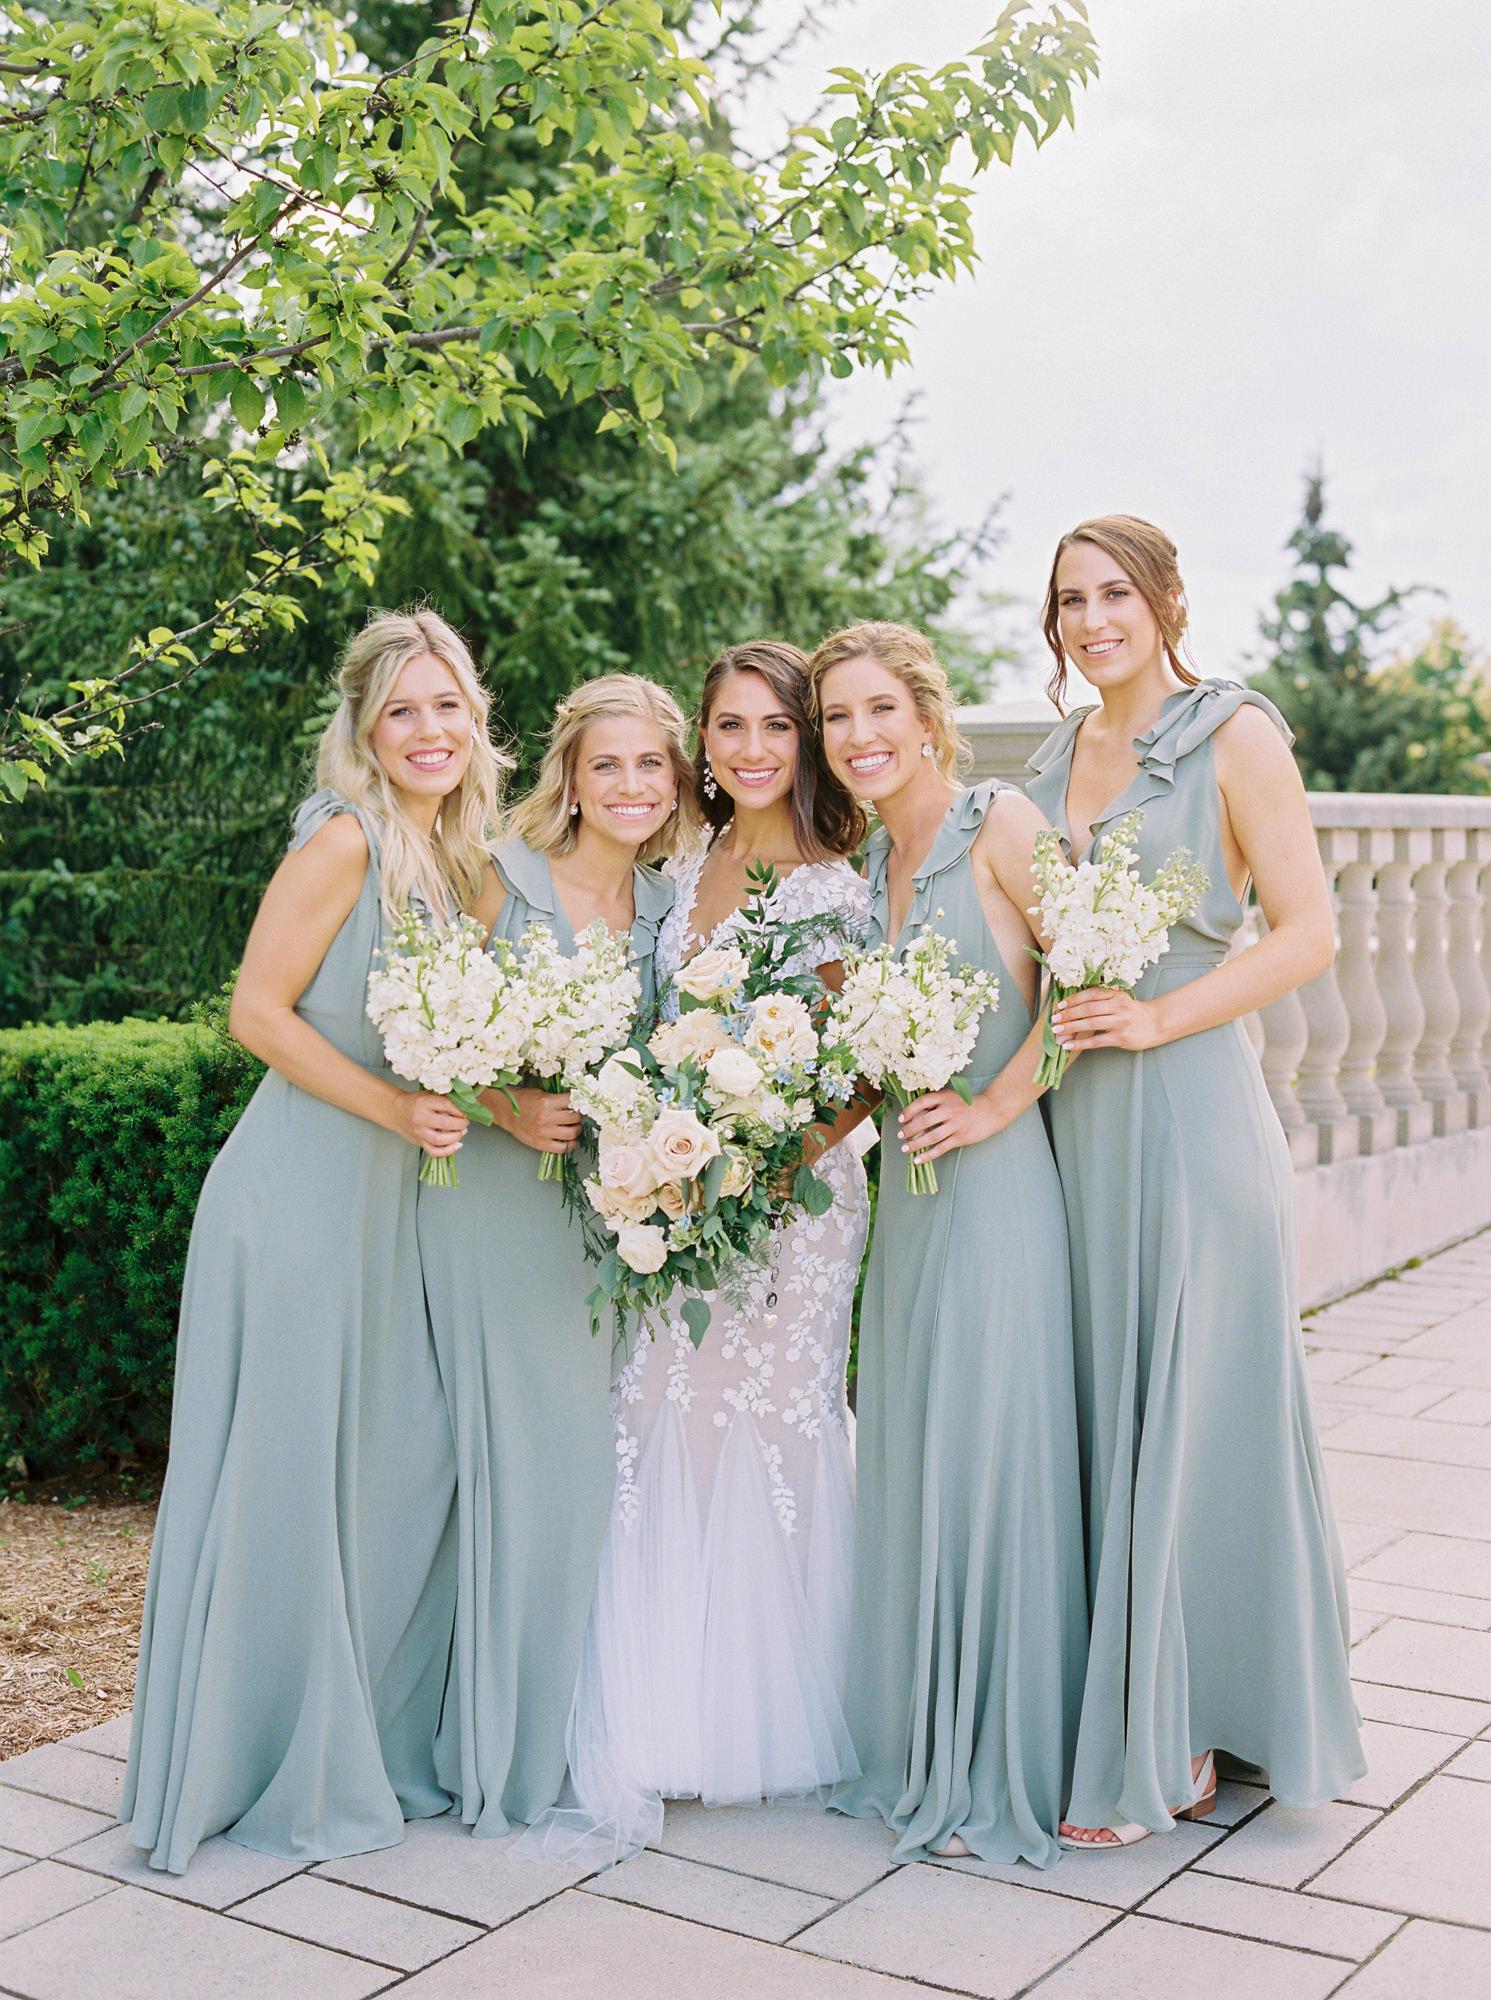 soft green colored long bridesmaids dresses